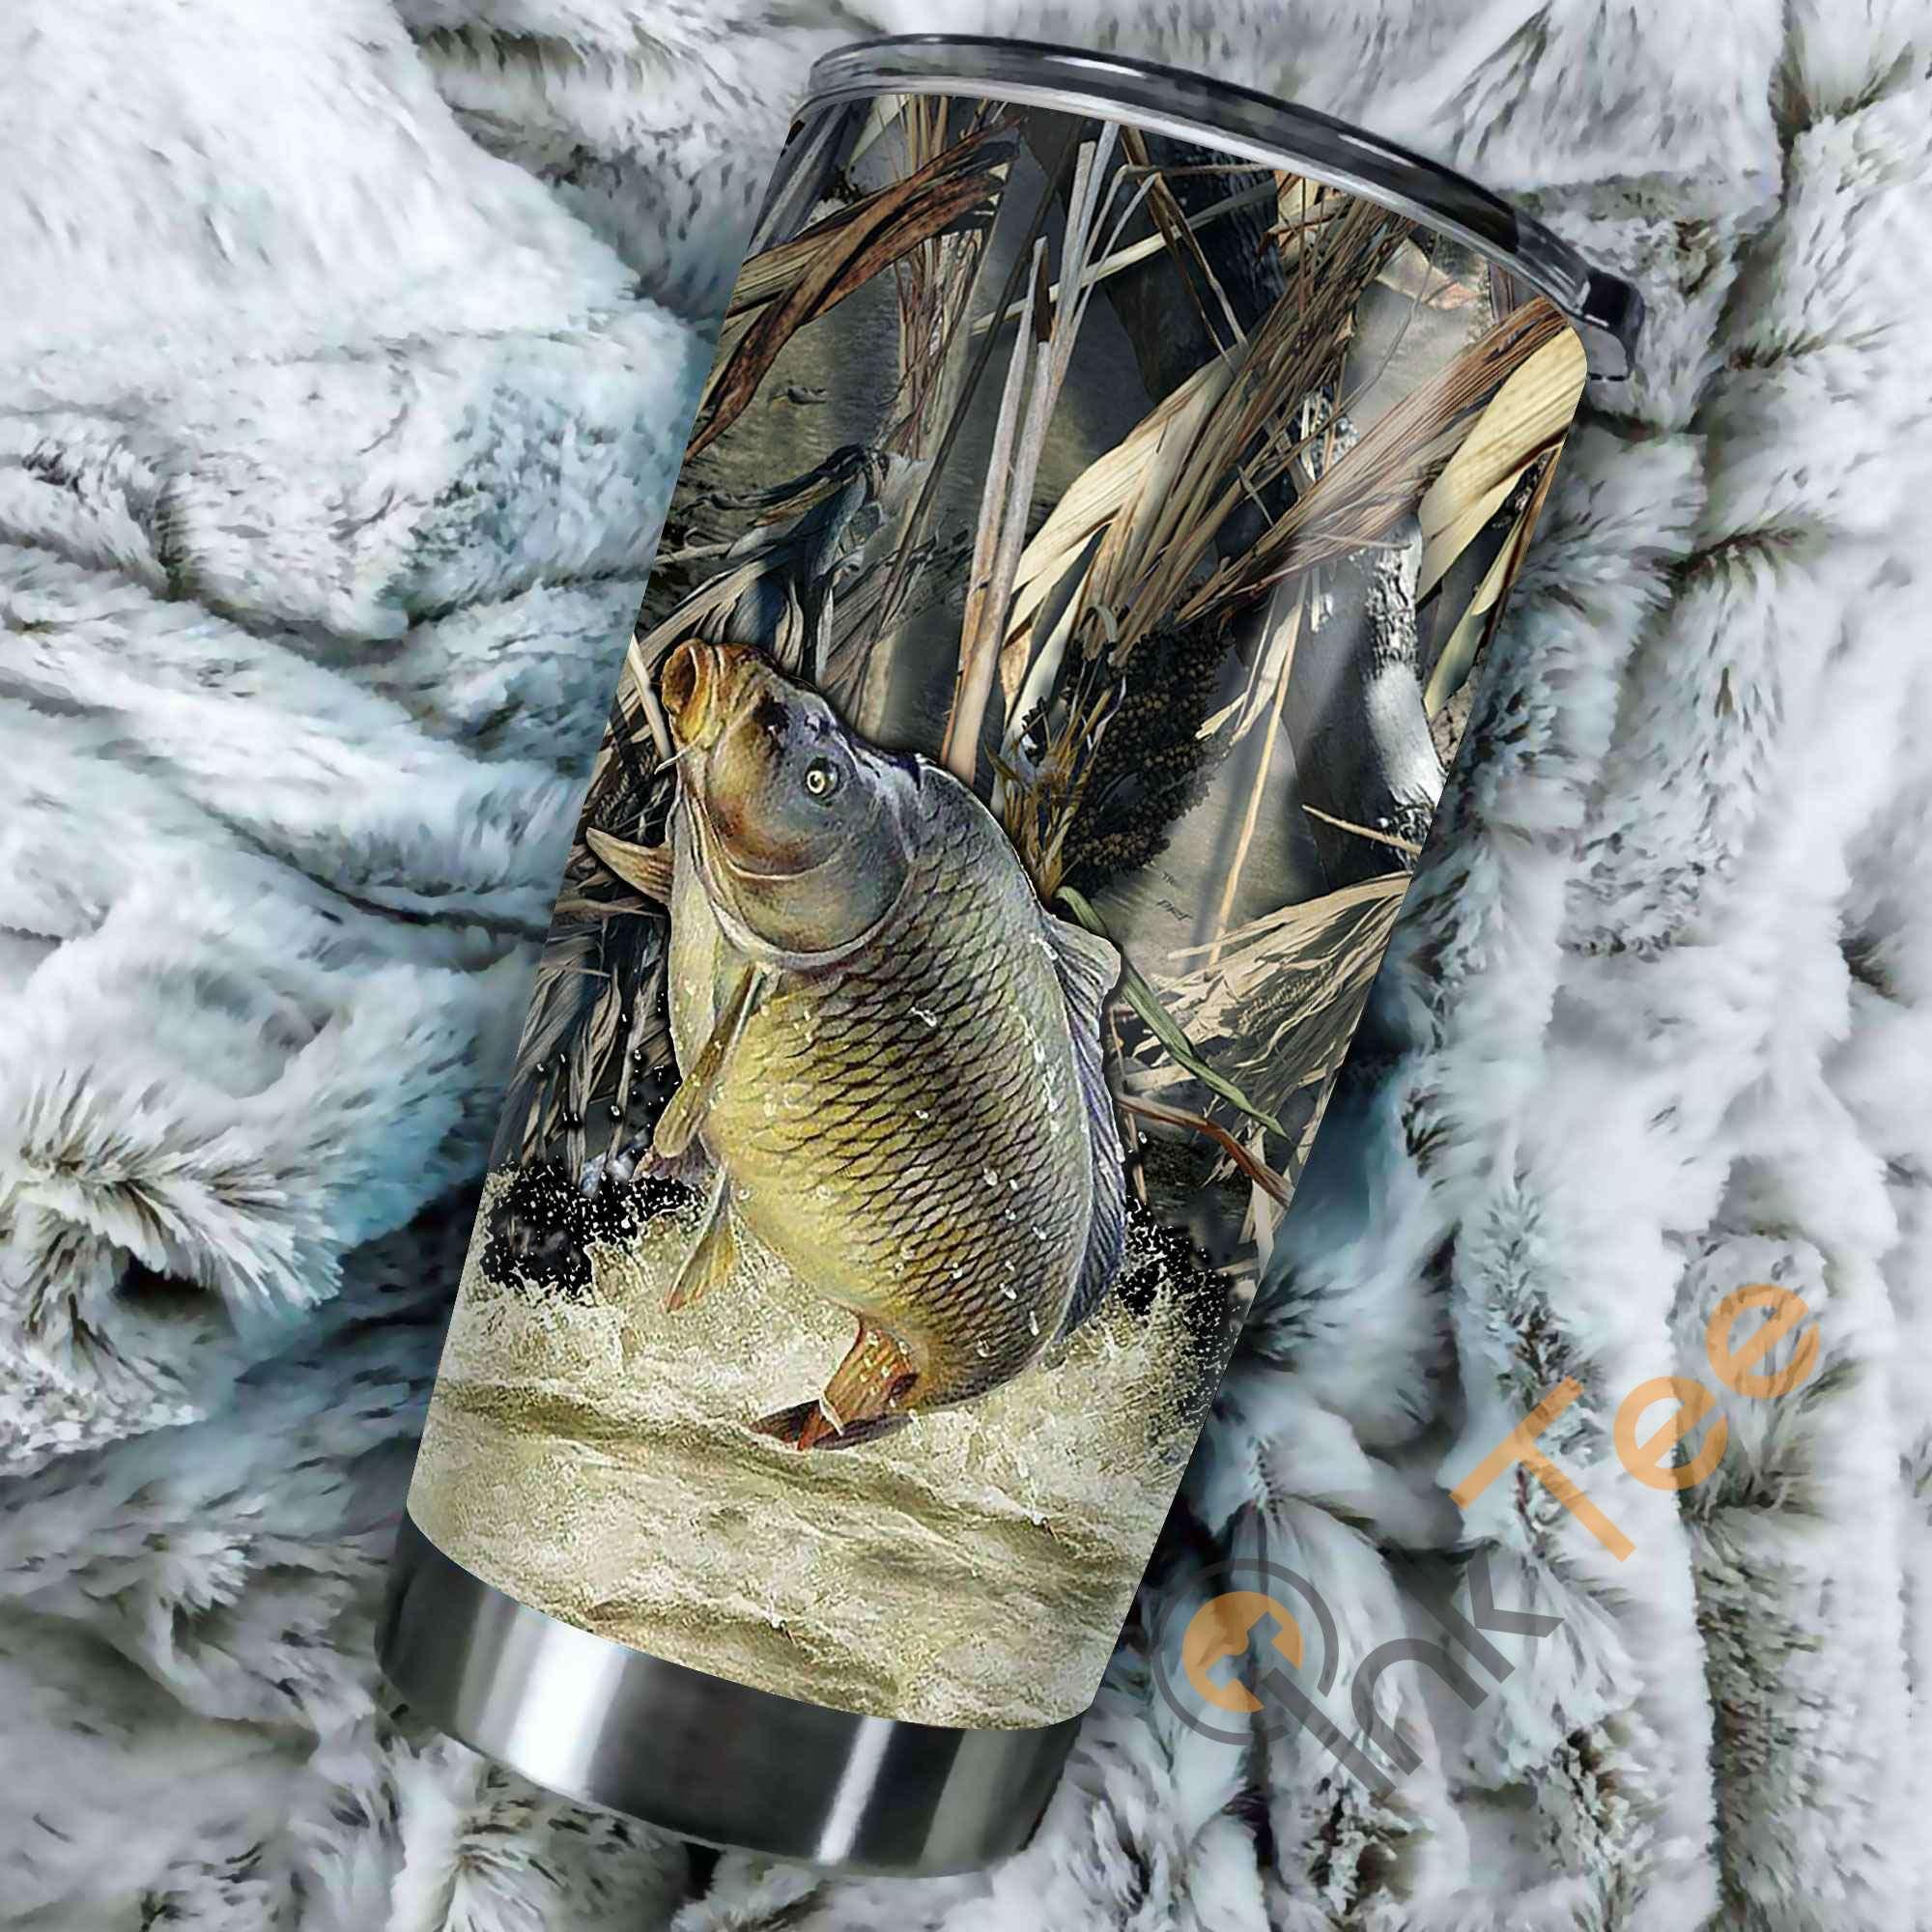 Carp Fishing Amazon Best Seller Sku 3757 Stainless Steel Tumbler